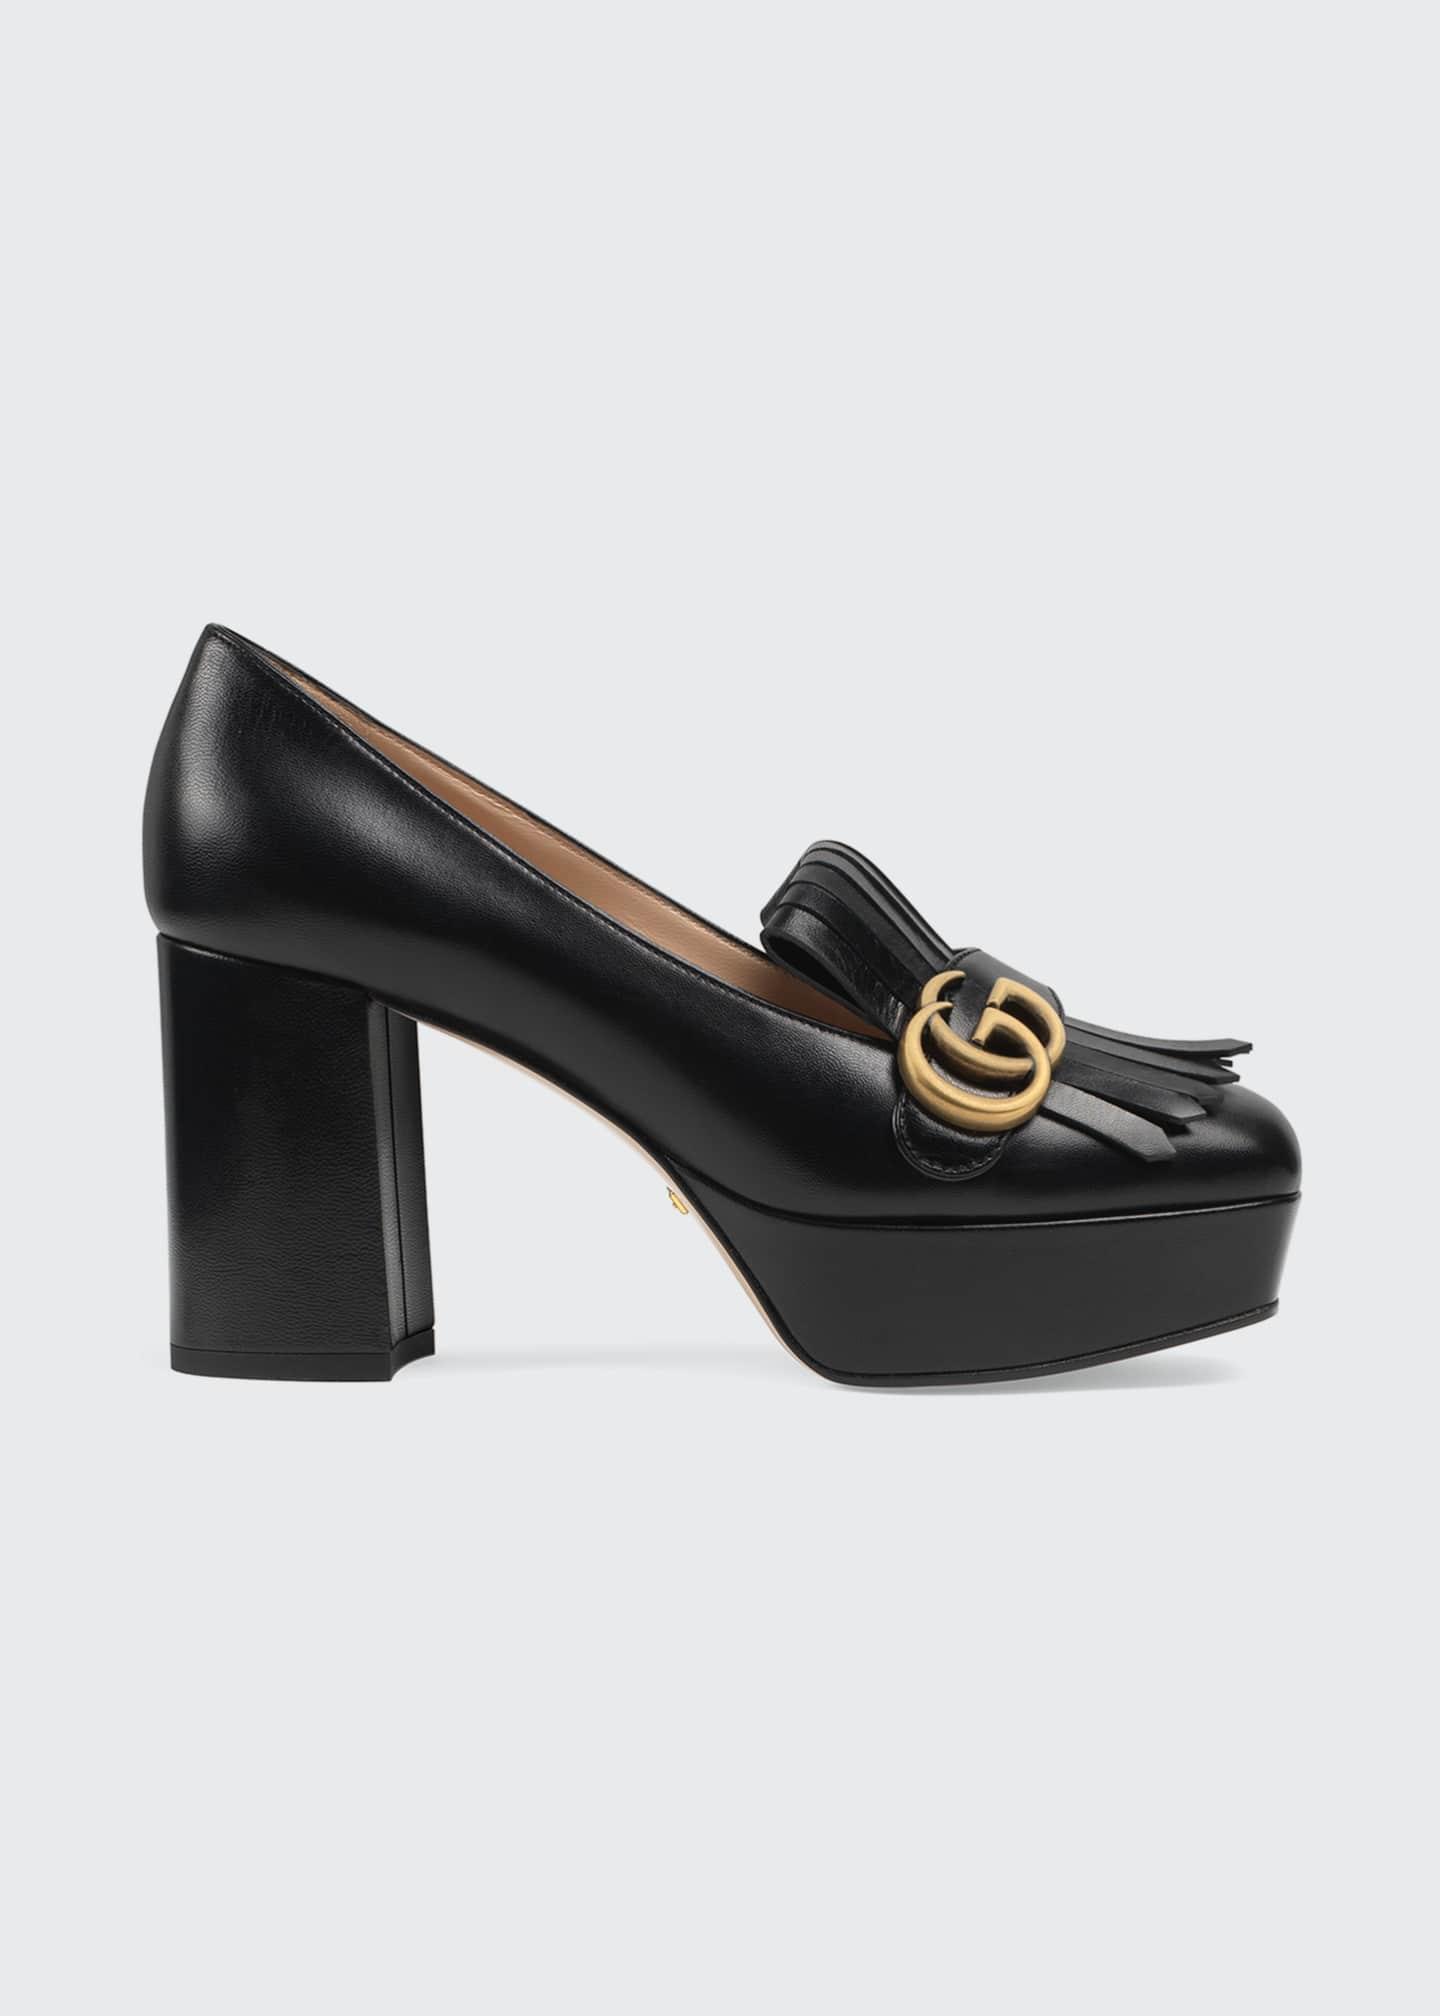 Gucci Marmont Kiltie Platform Pumps